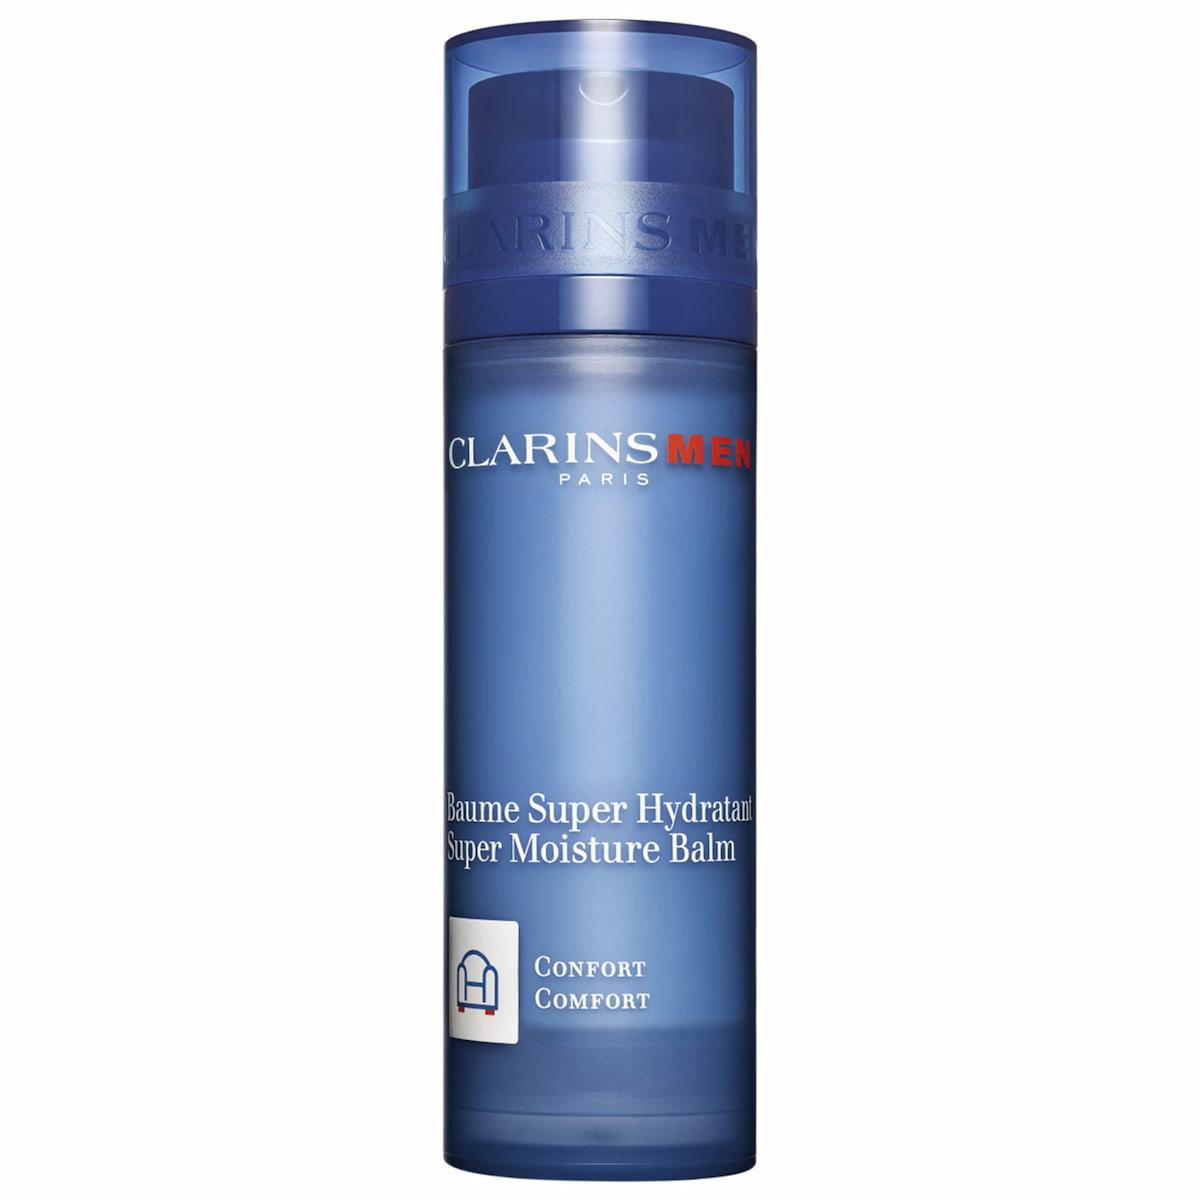 Baume Super Hydratant - CLARINS MEN